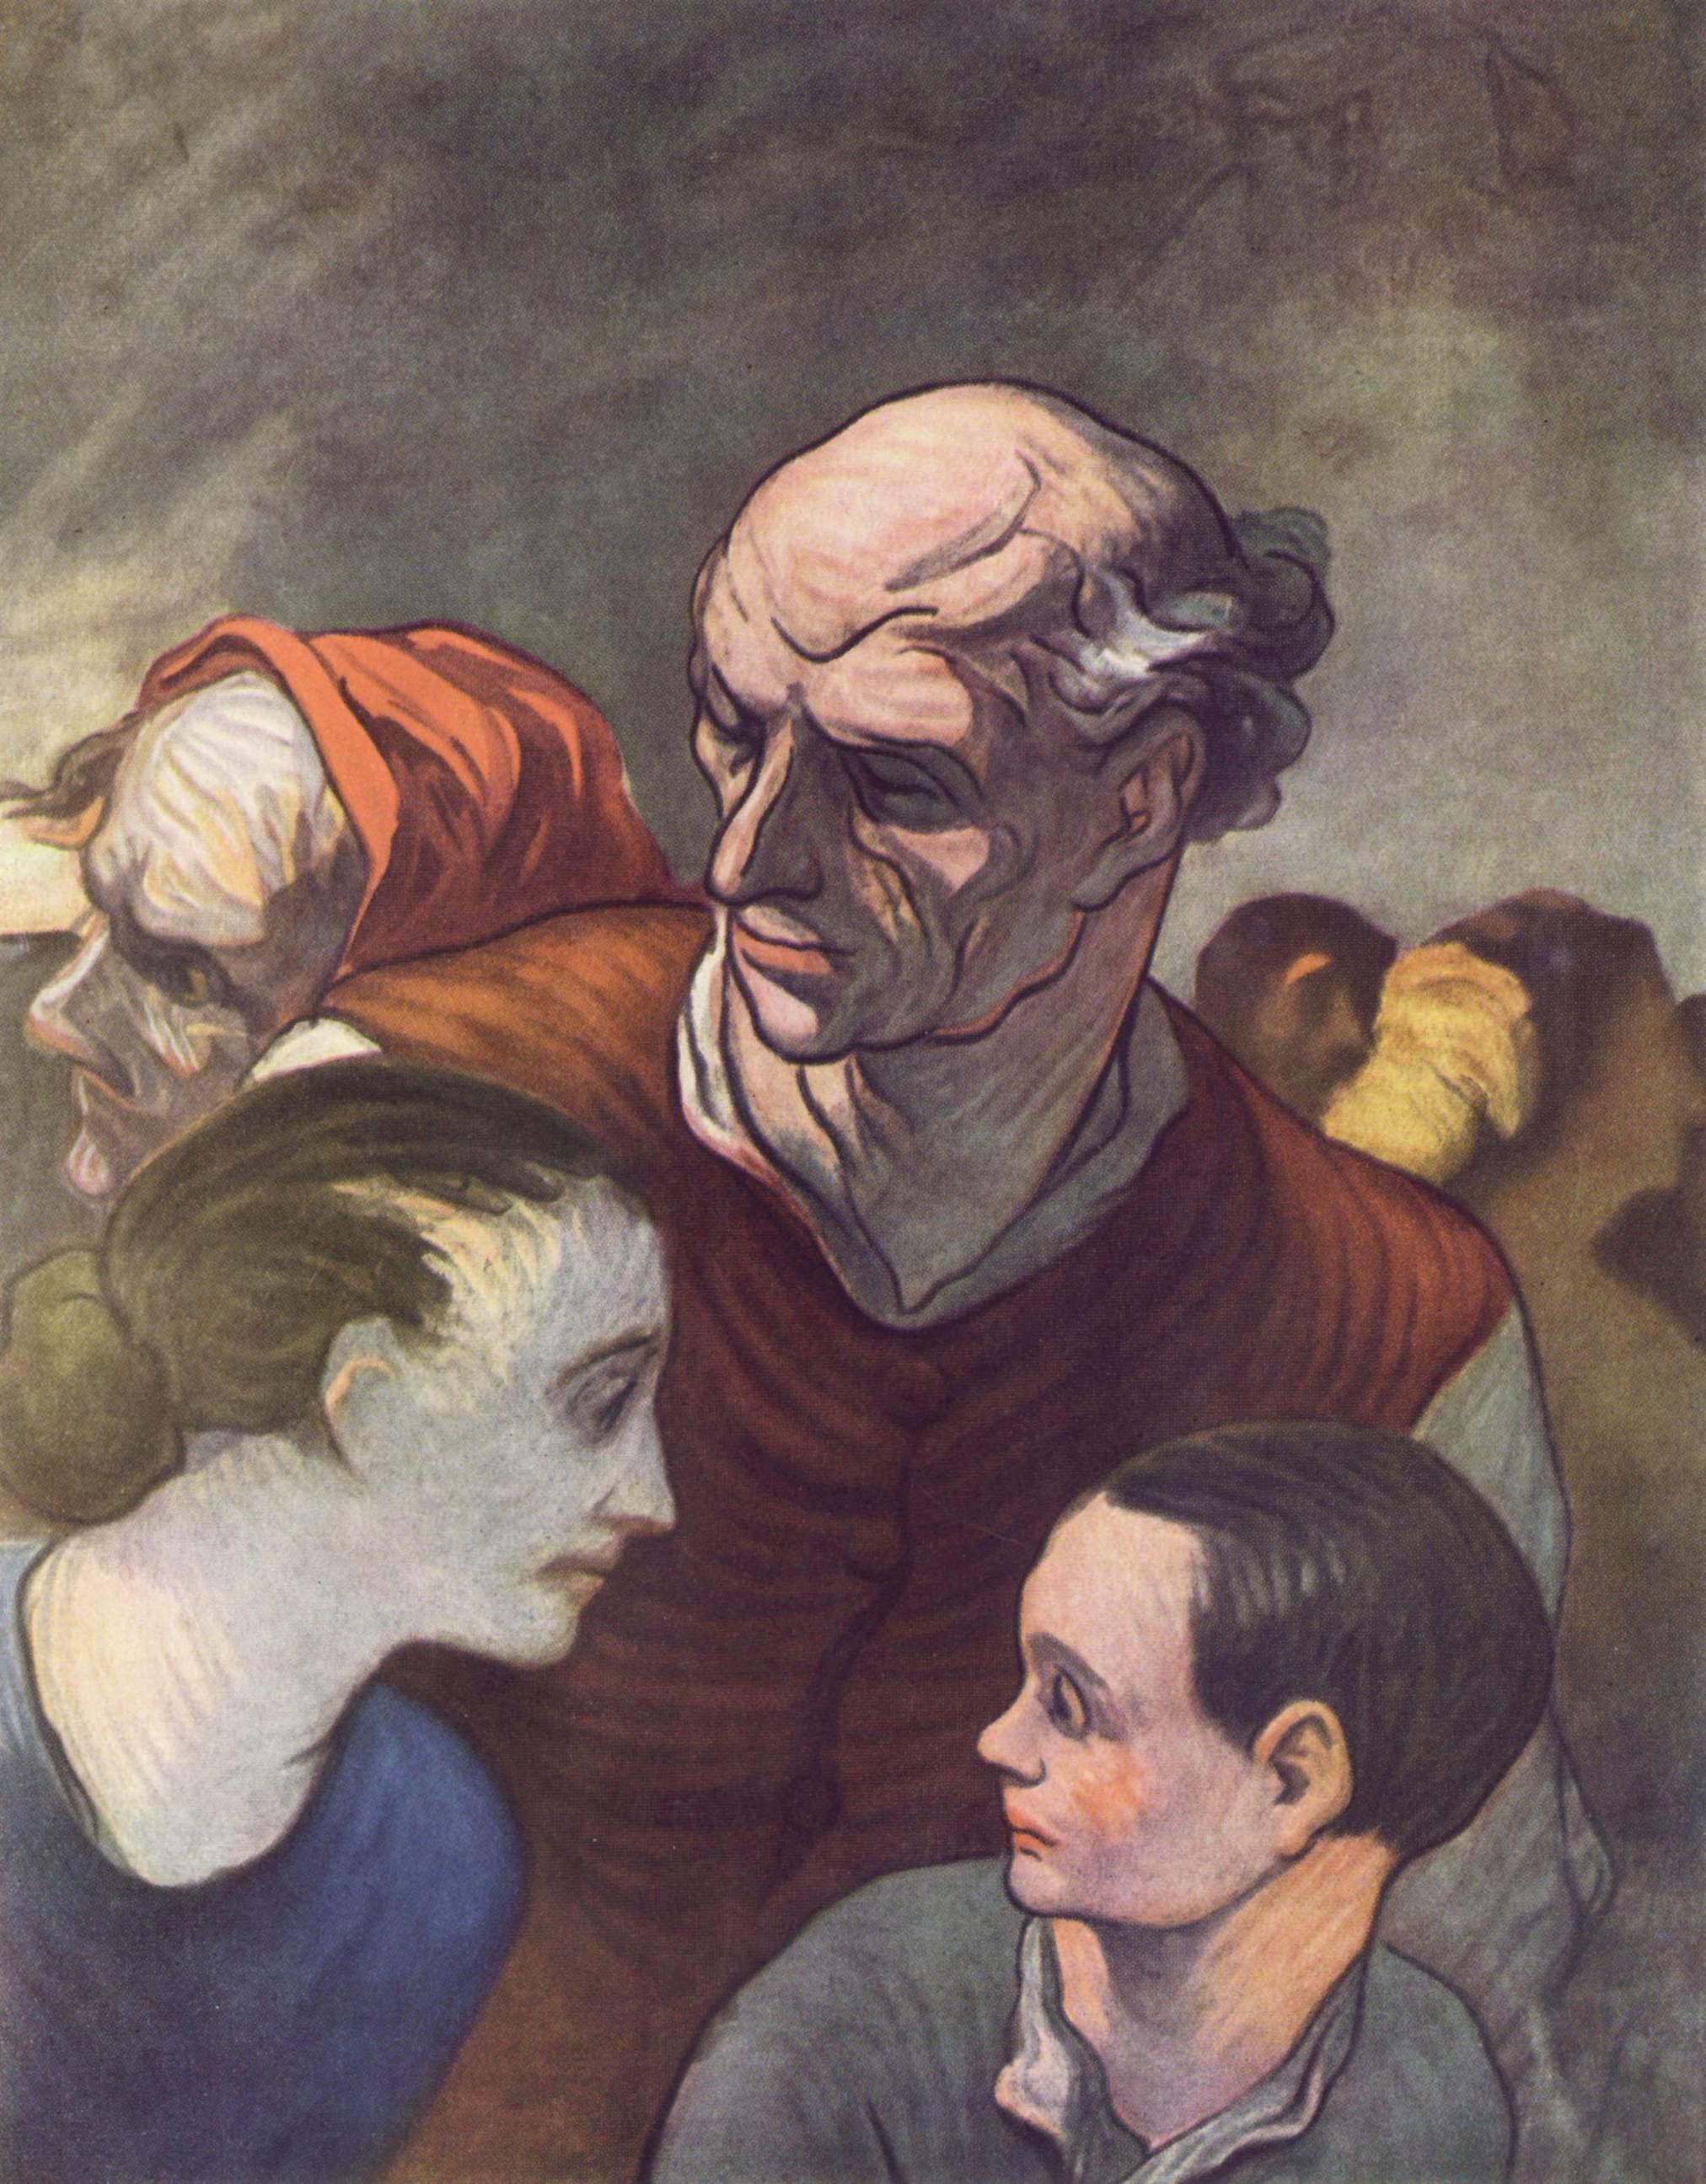 Семья на баррикаде, Домье Оноре